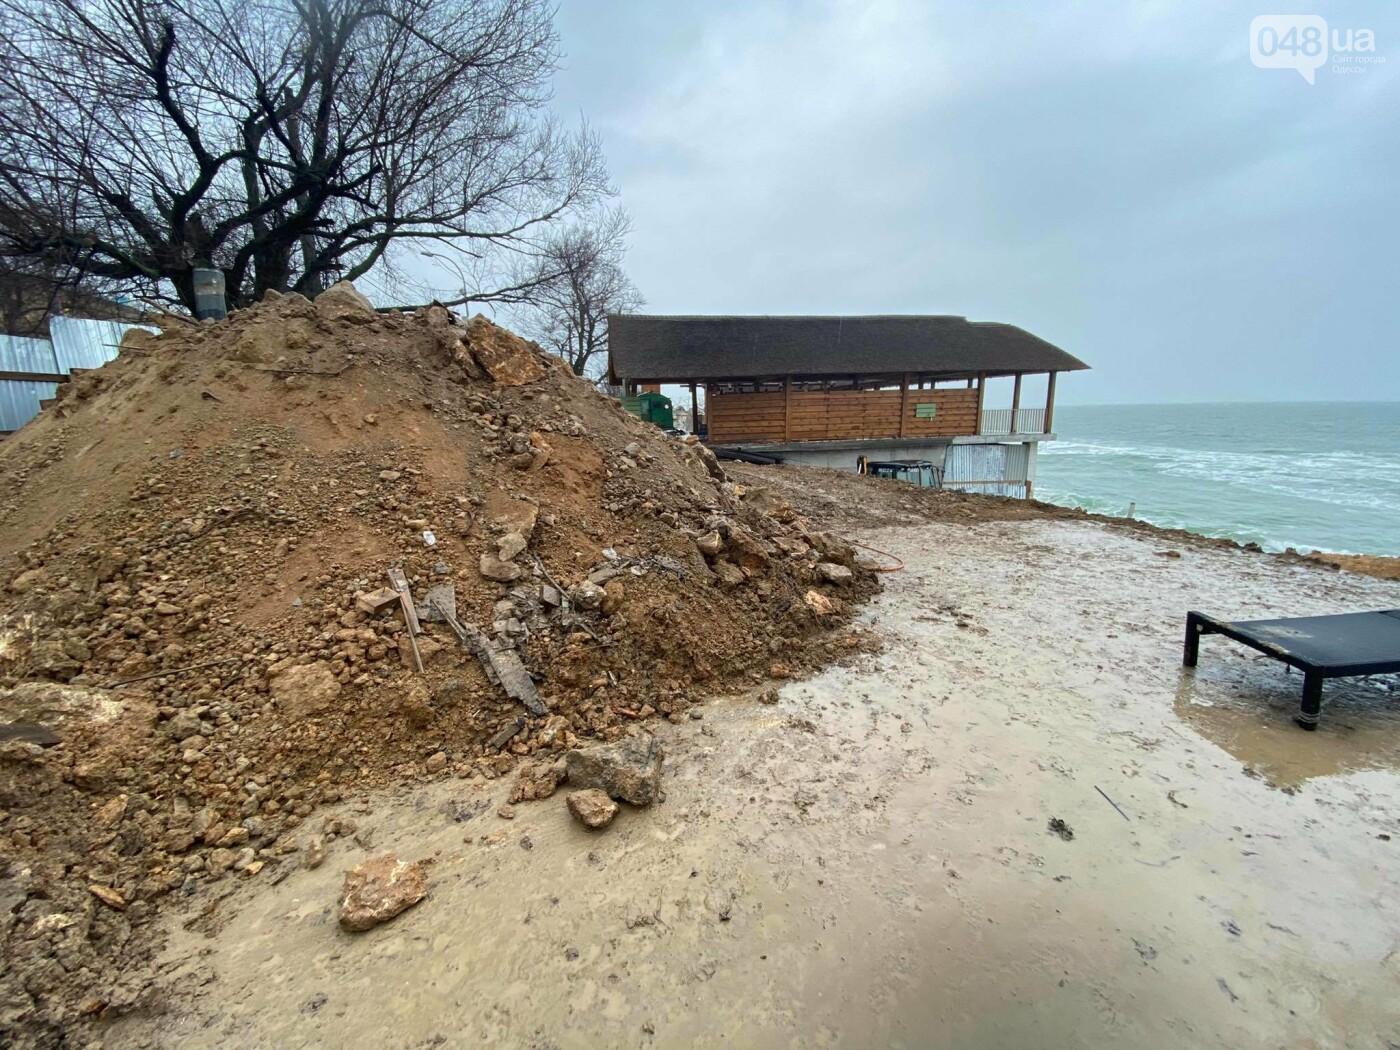 В Аркадии на побережье активист нашел незаконную стройку,- ФОТО, ВИДЕО, фото-5